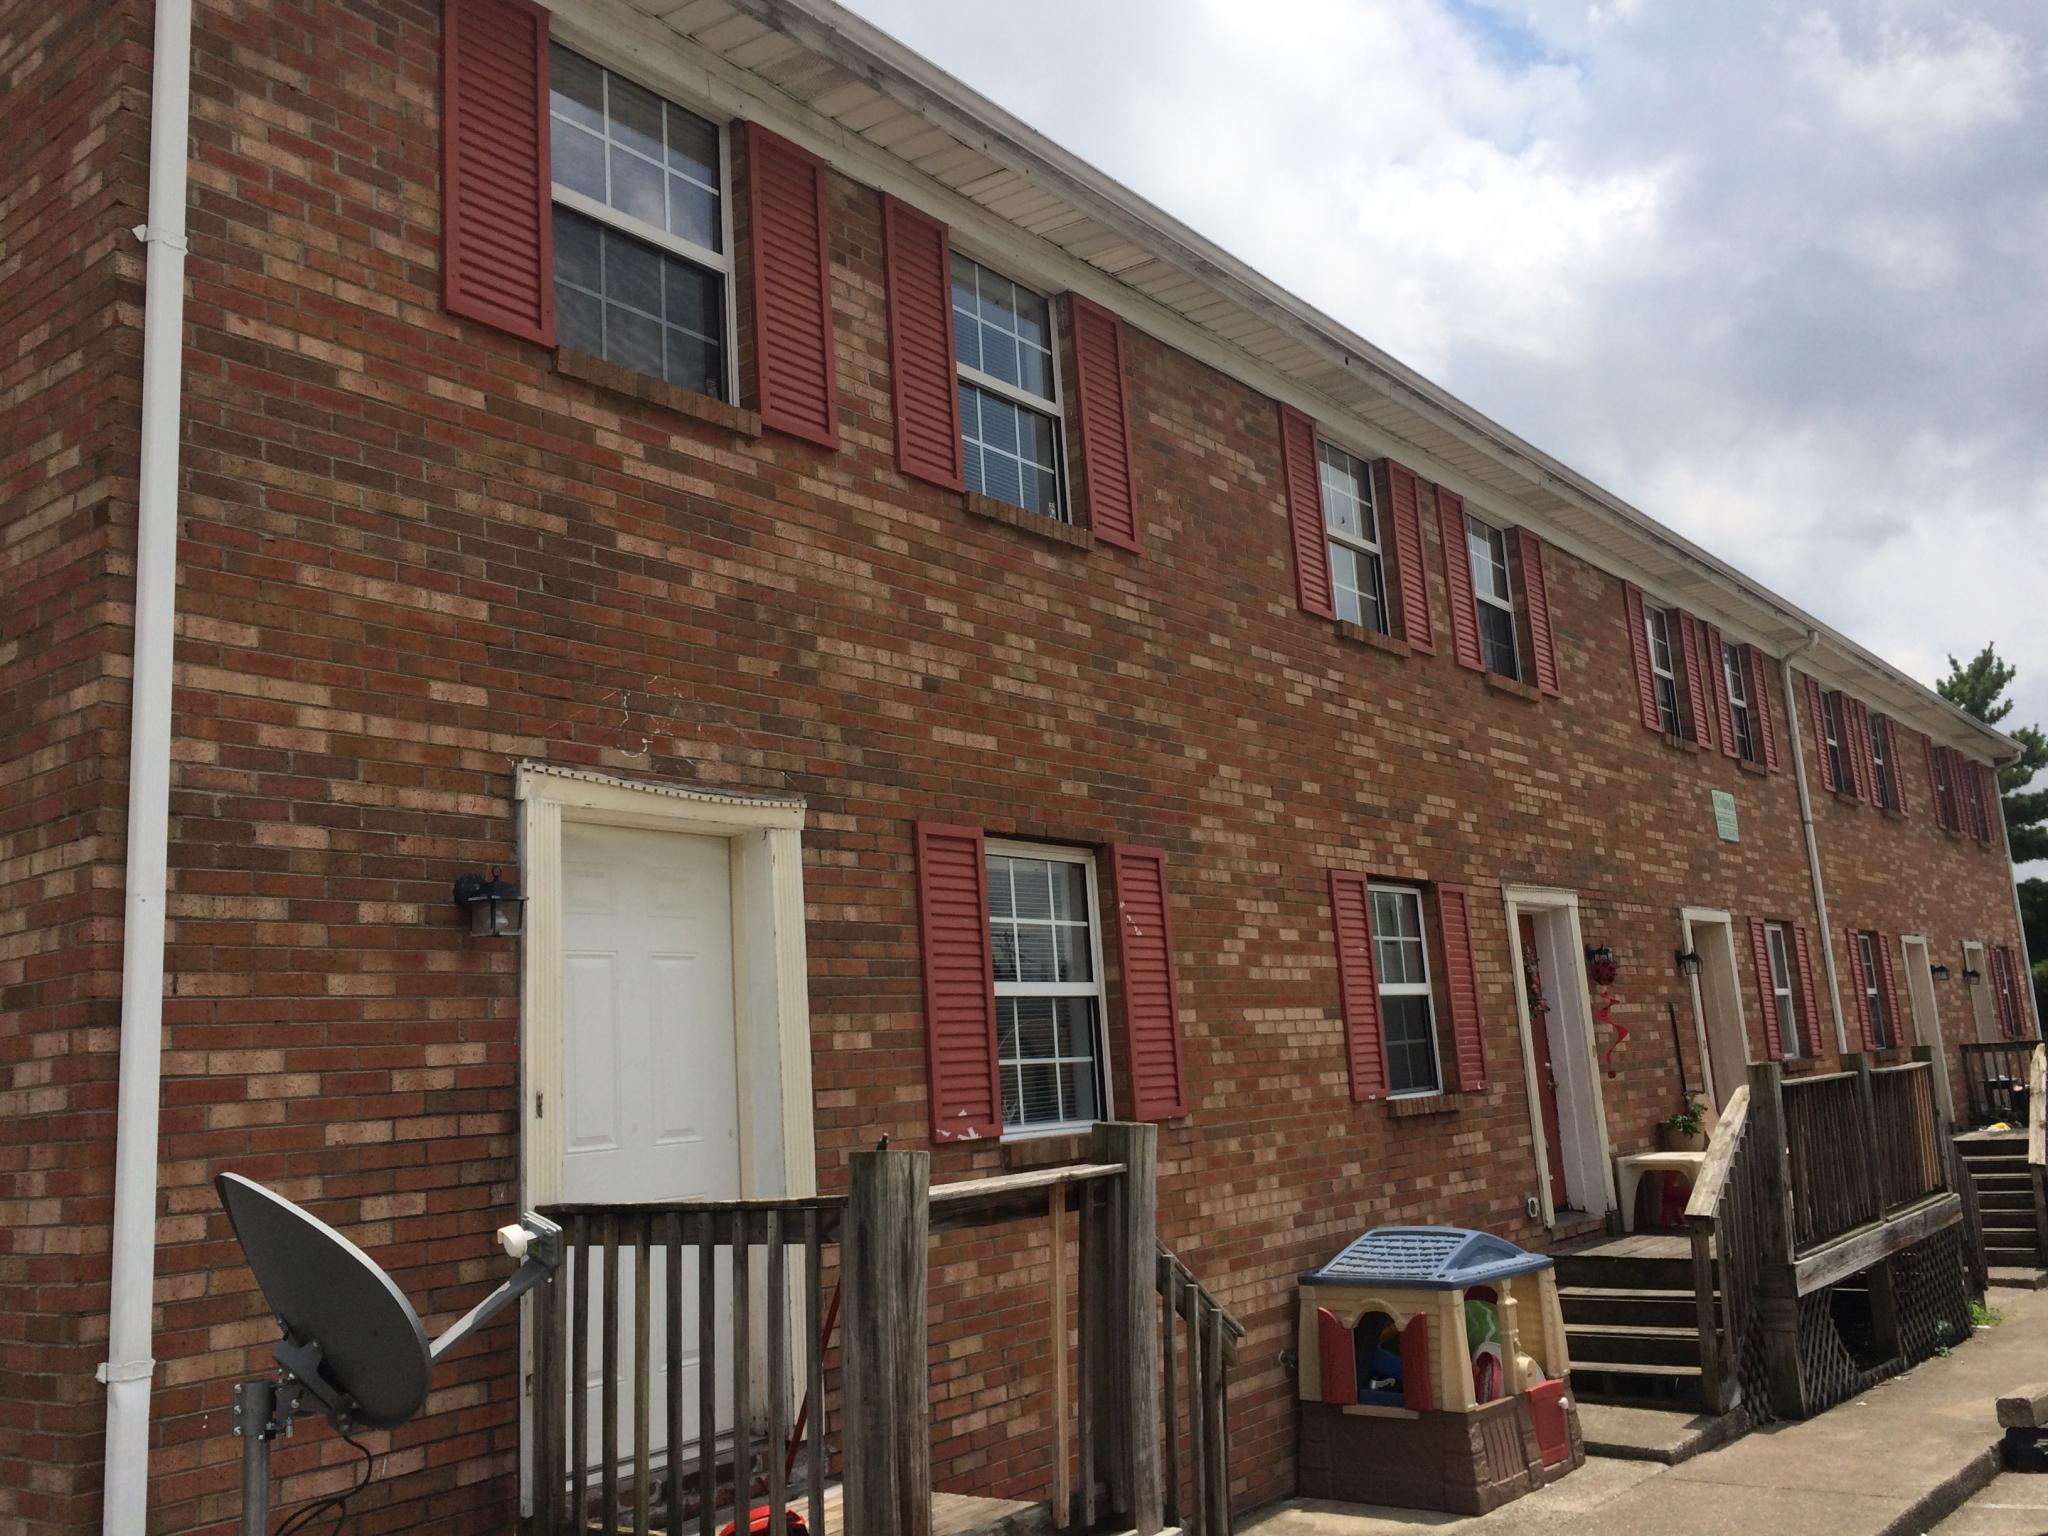 1671 Foxhaven Dr #46, Richmond, KY 40475 For Rent | Trulia